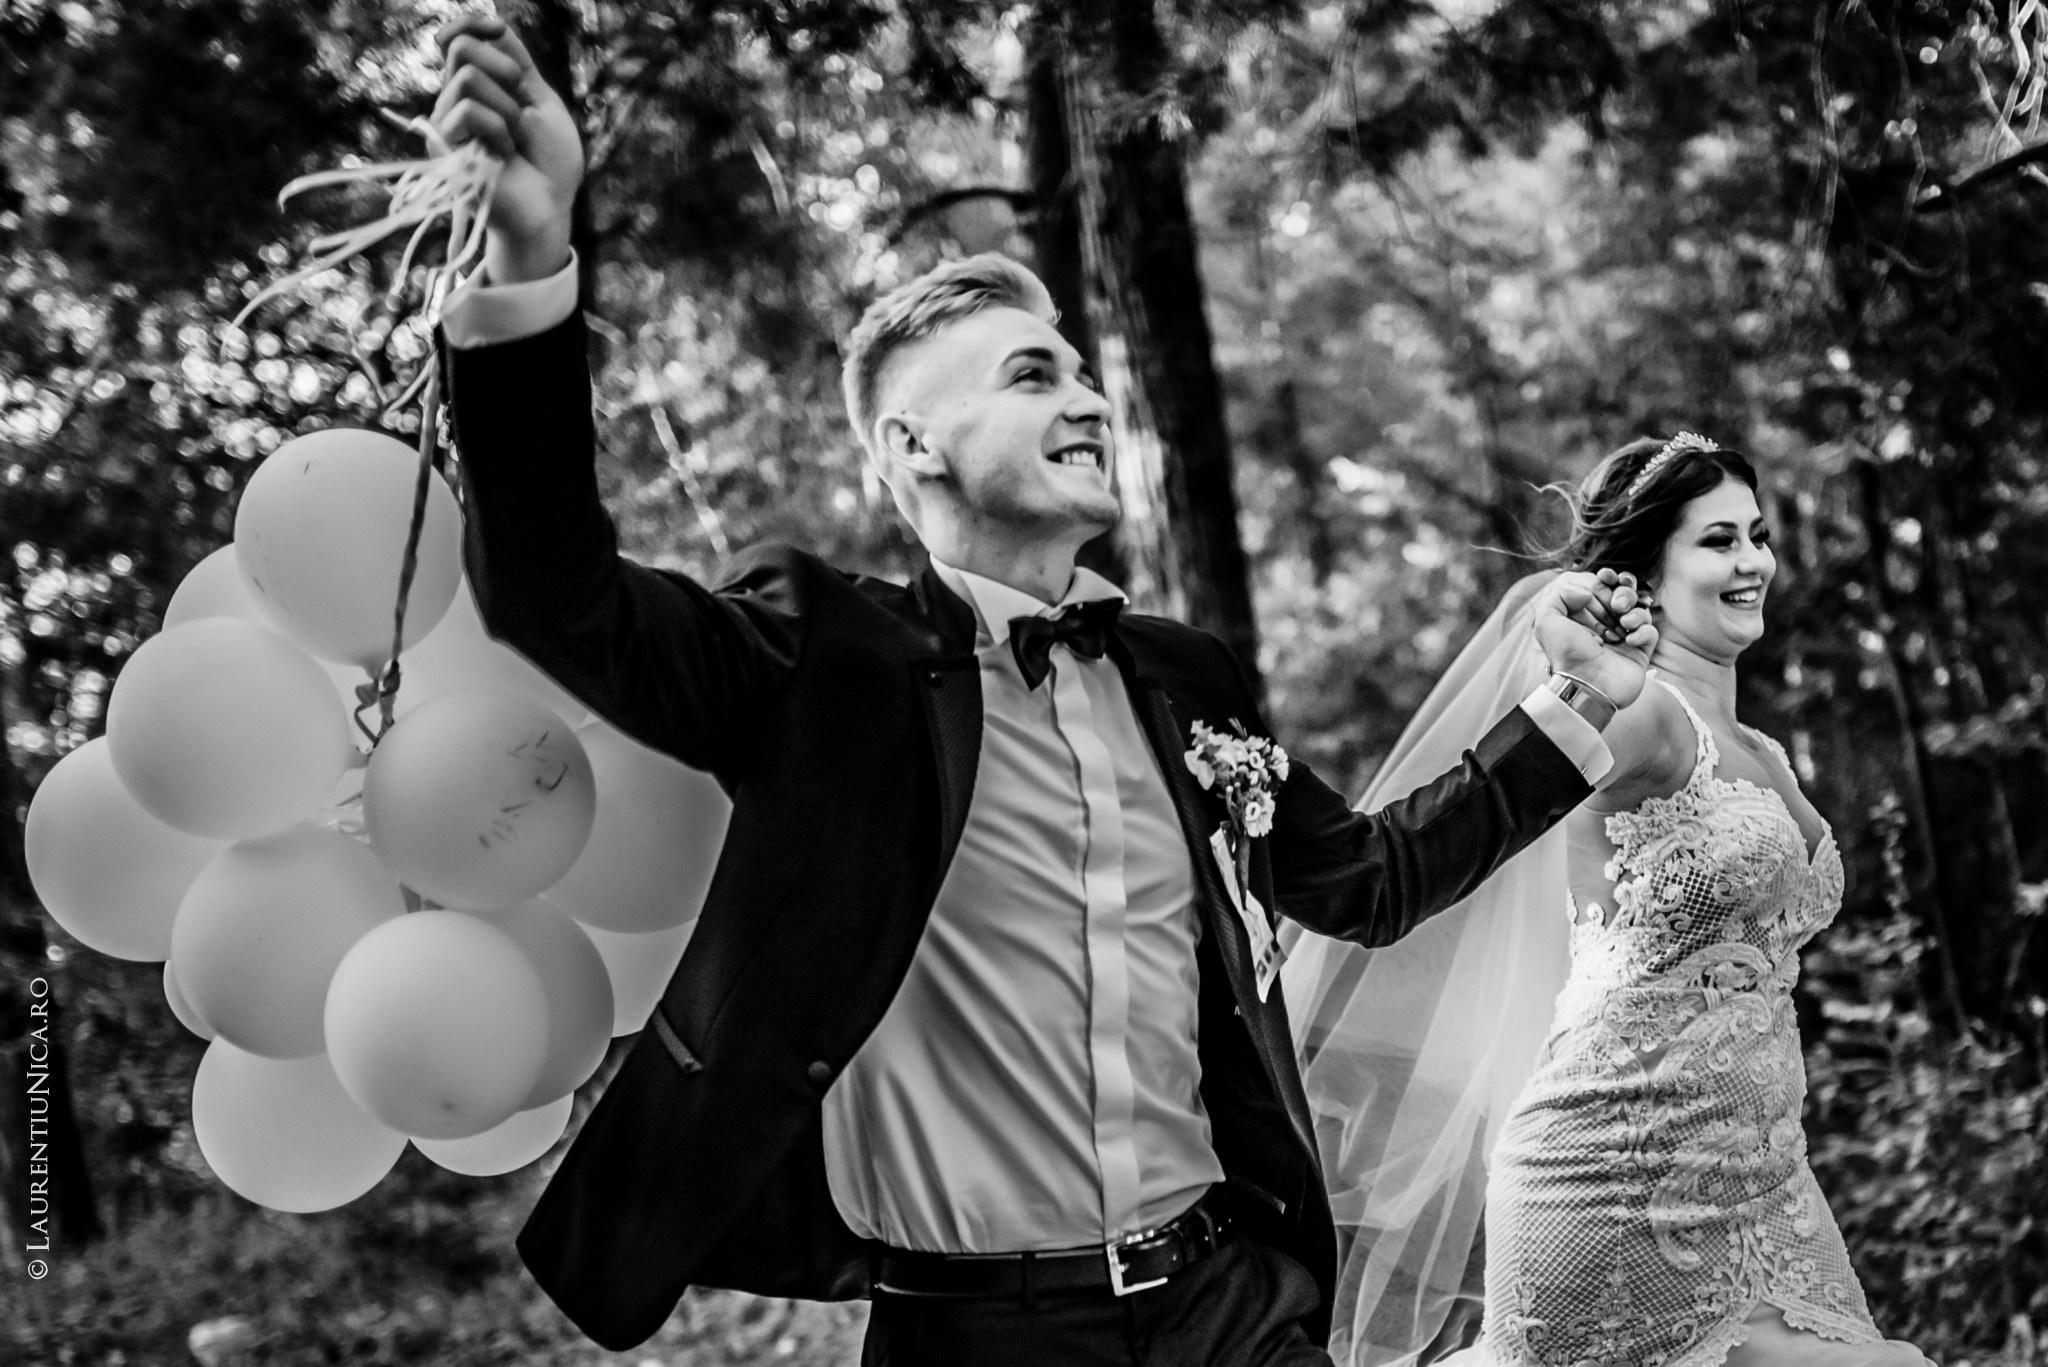 fotografii nunta Roxana si Cosmin fotograf nunta laurentiu nica 33 - Roxana & Cosmin | Fotografii nunta | Ticleni, judetul Gorj